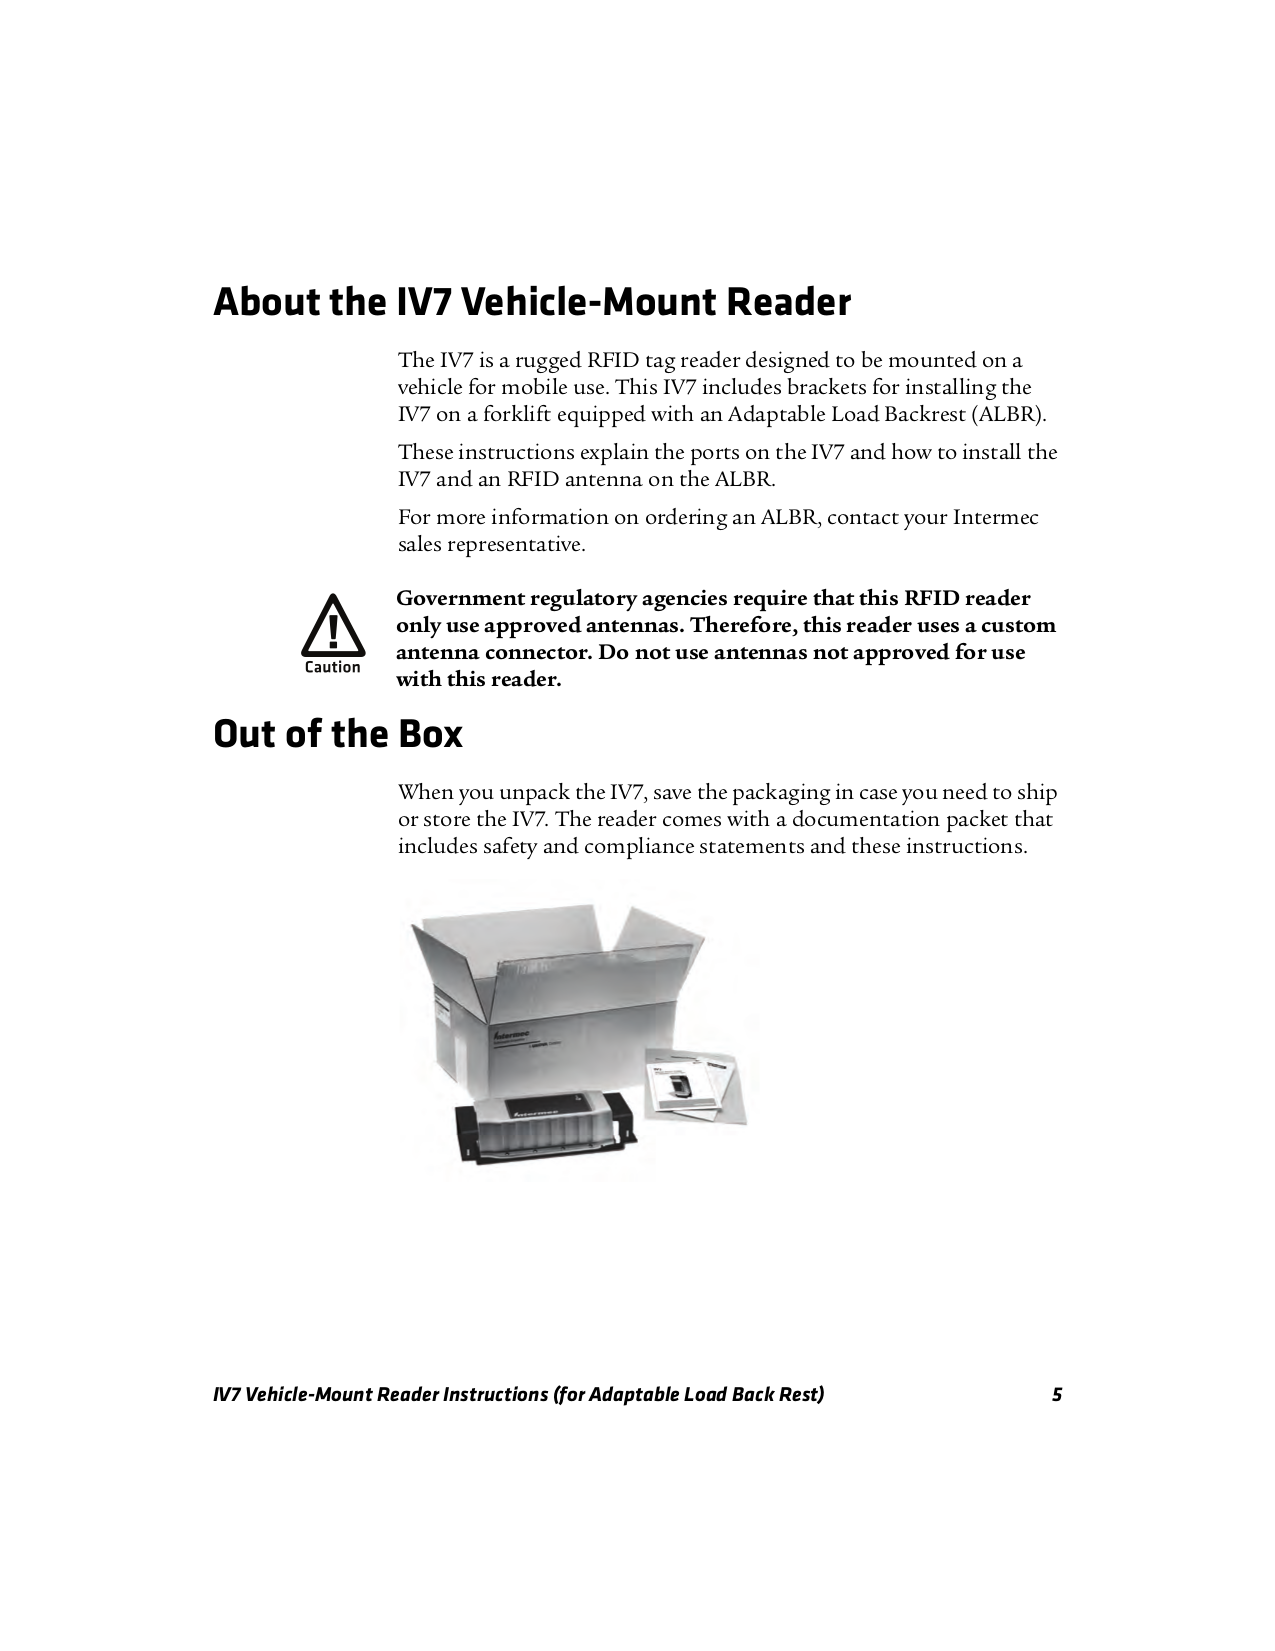 PDF manual for Intermec Other IV7 RFID Reader